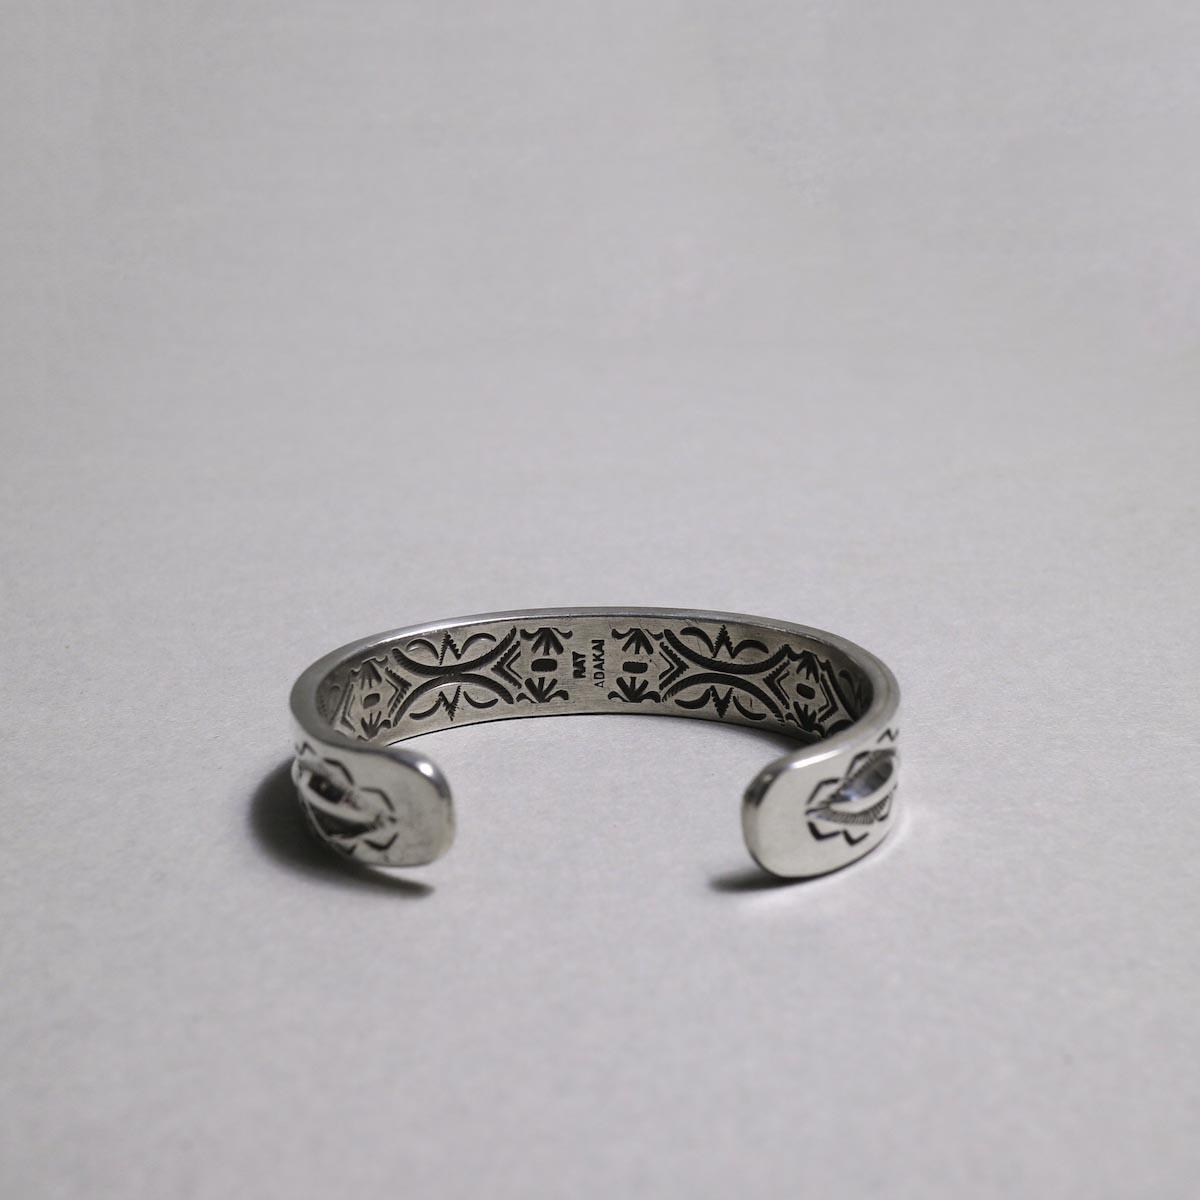 RAY ADAKAI / Double Stamp Bracelet (C)内側スタンプ